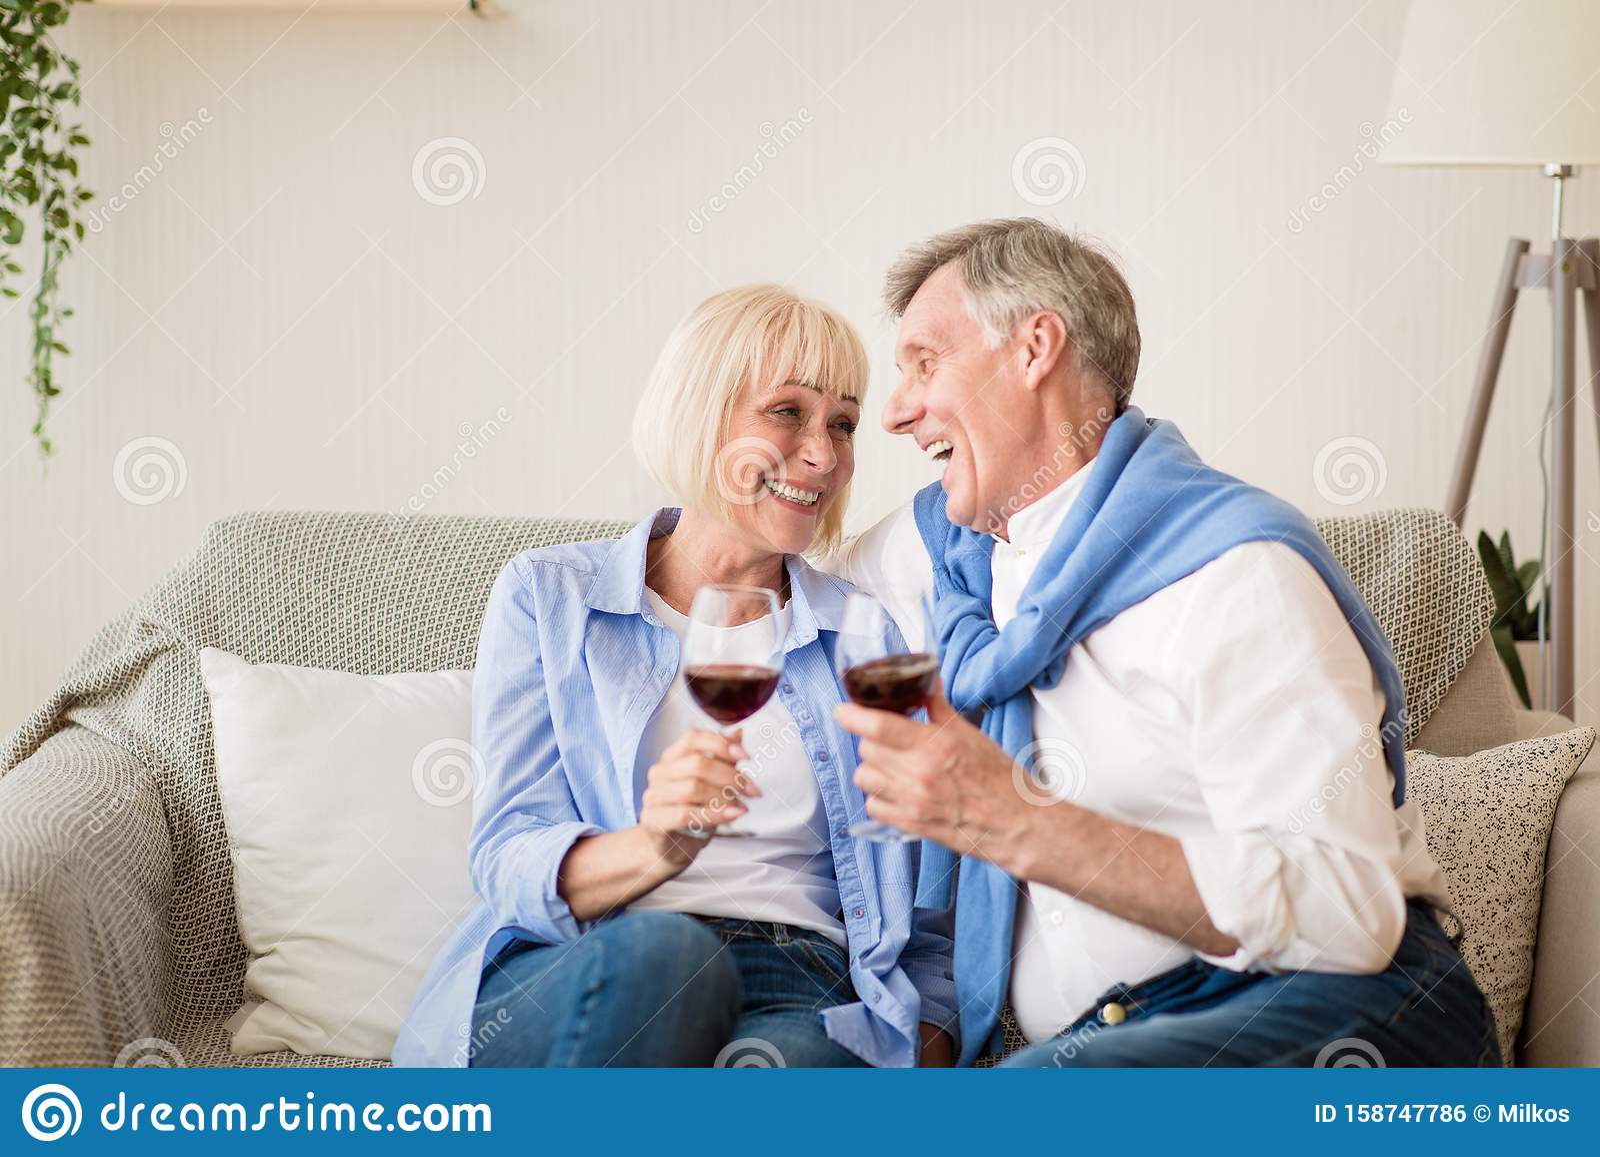 rencontre gard femme couple mature français